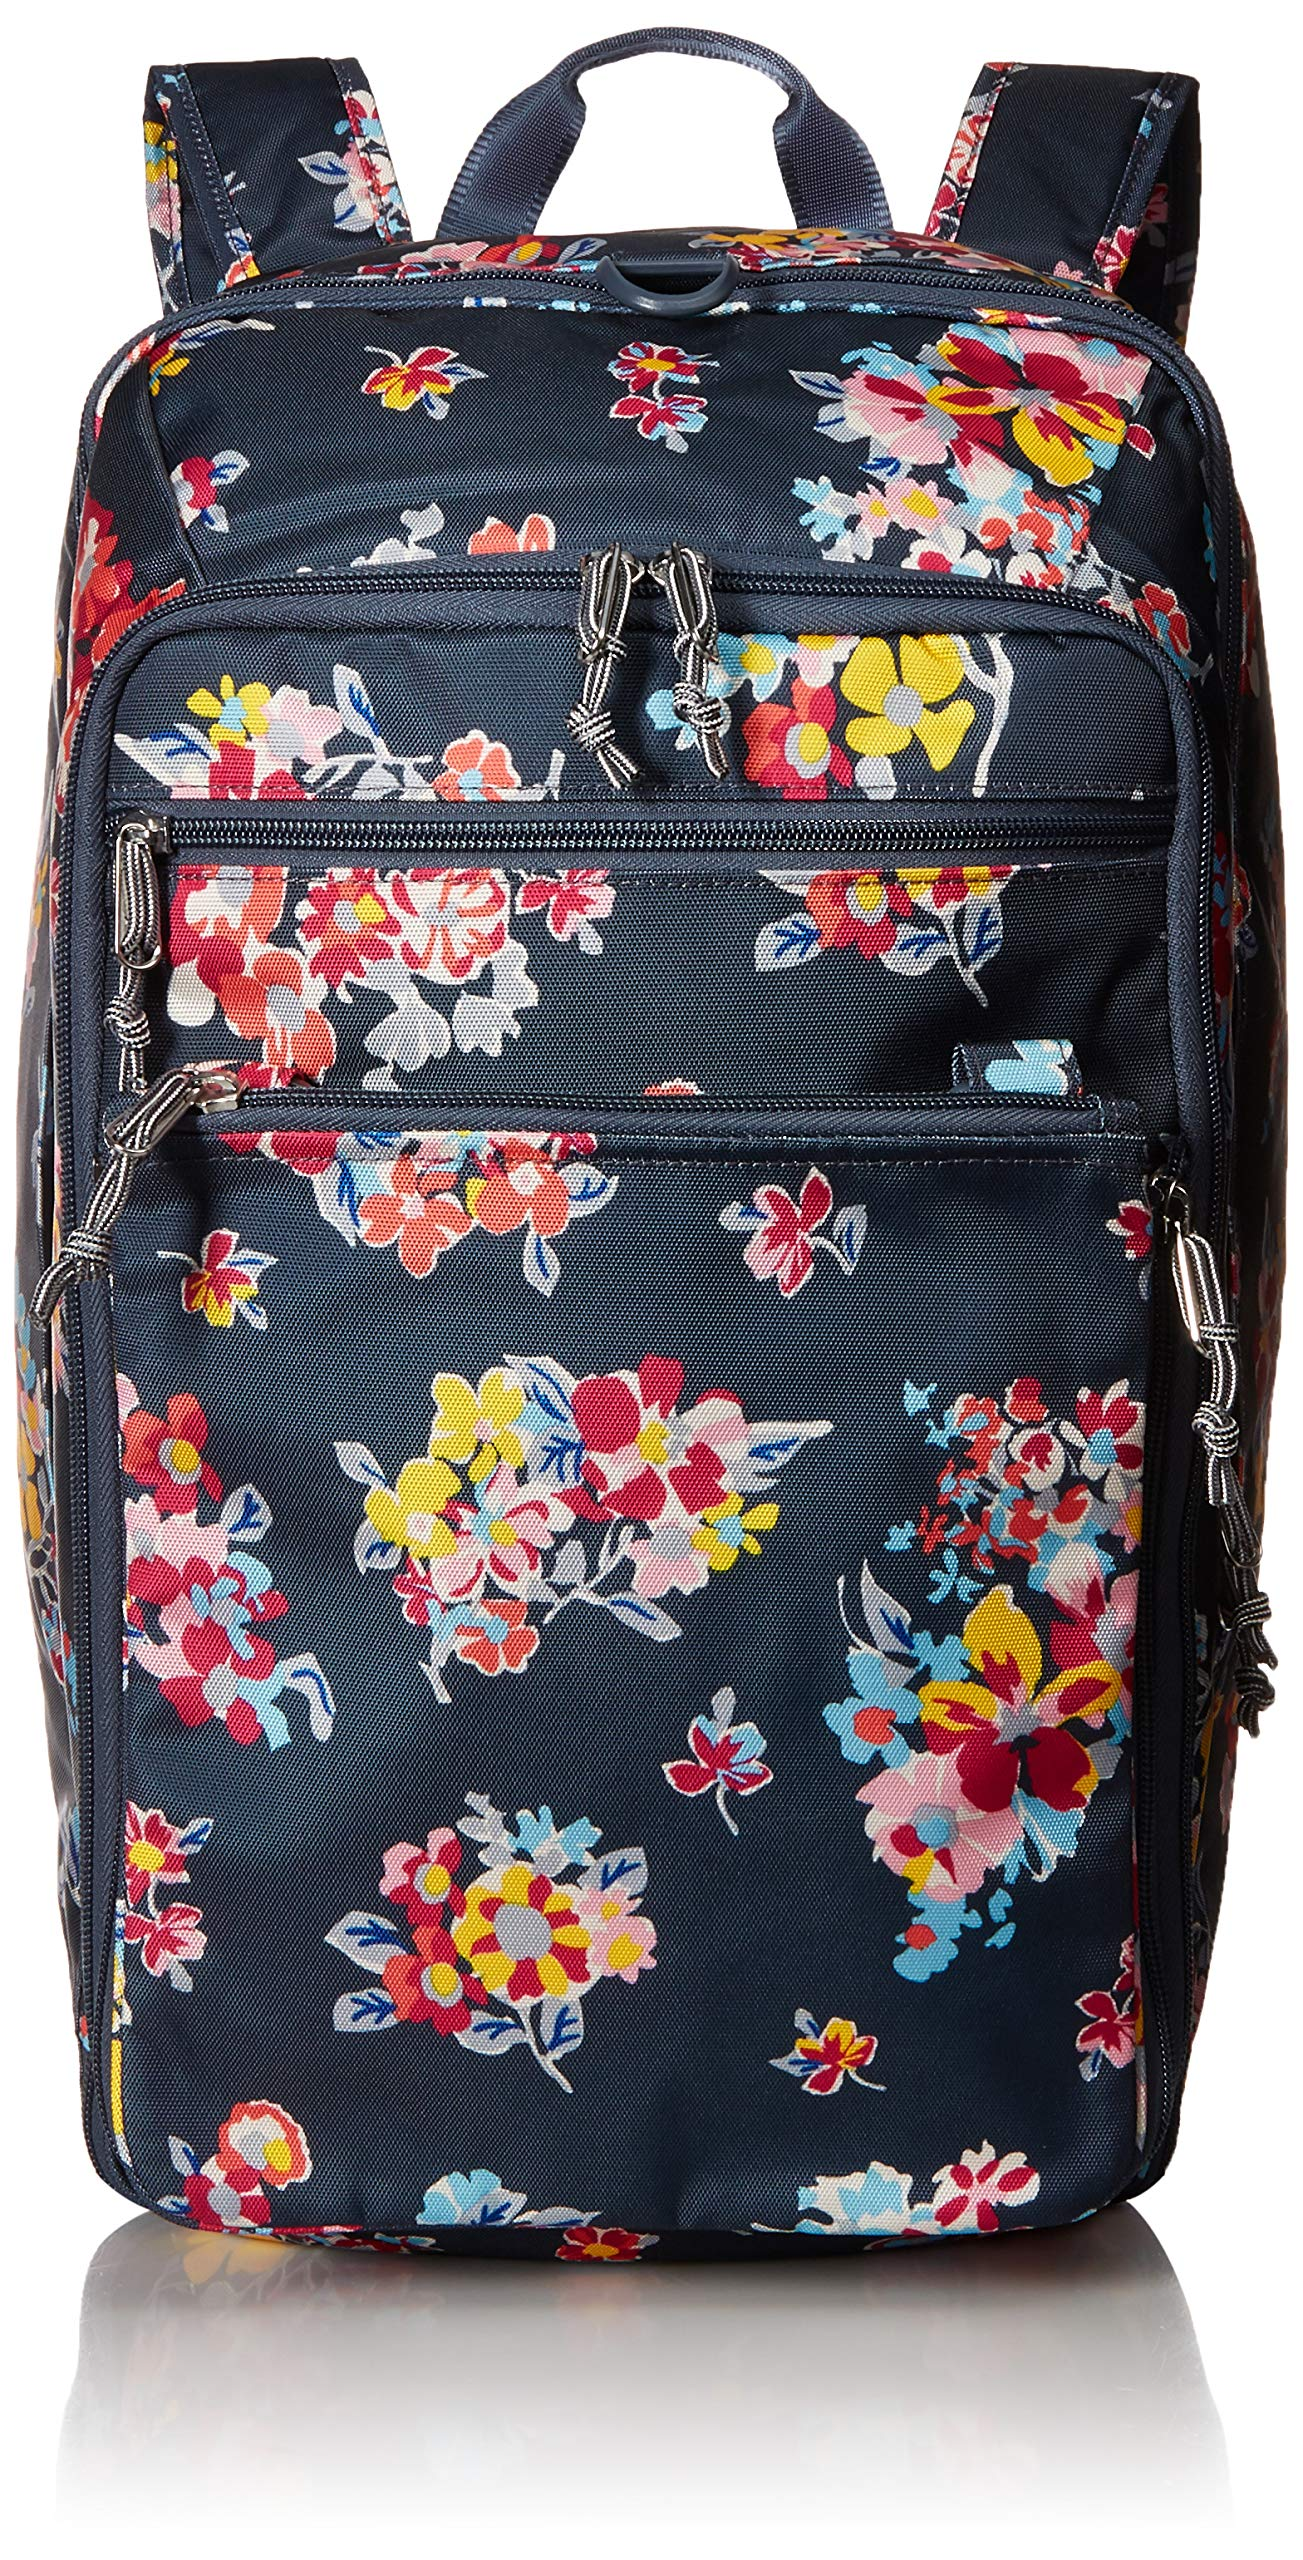 Vera Bradley Lighten Up Convertible Travel Bag, Tossed Posies